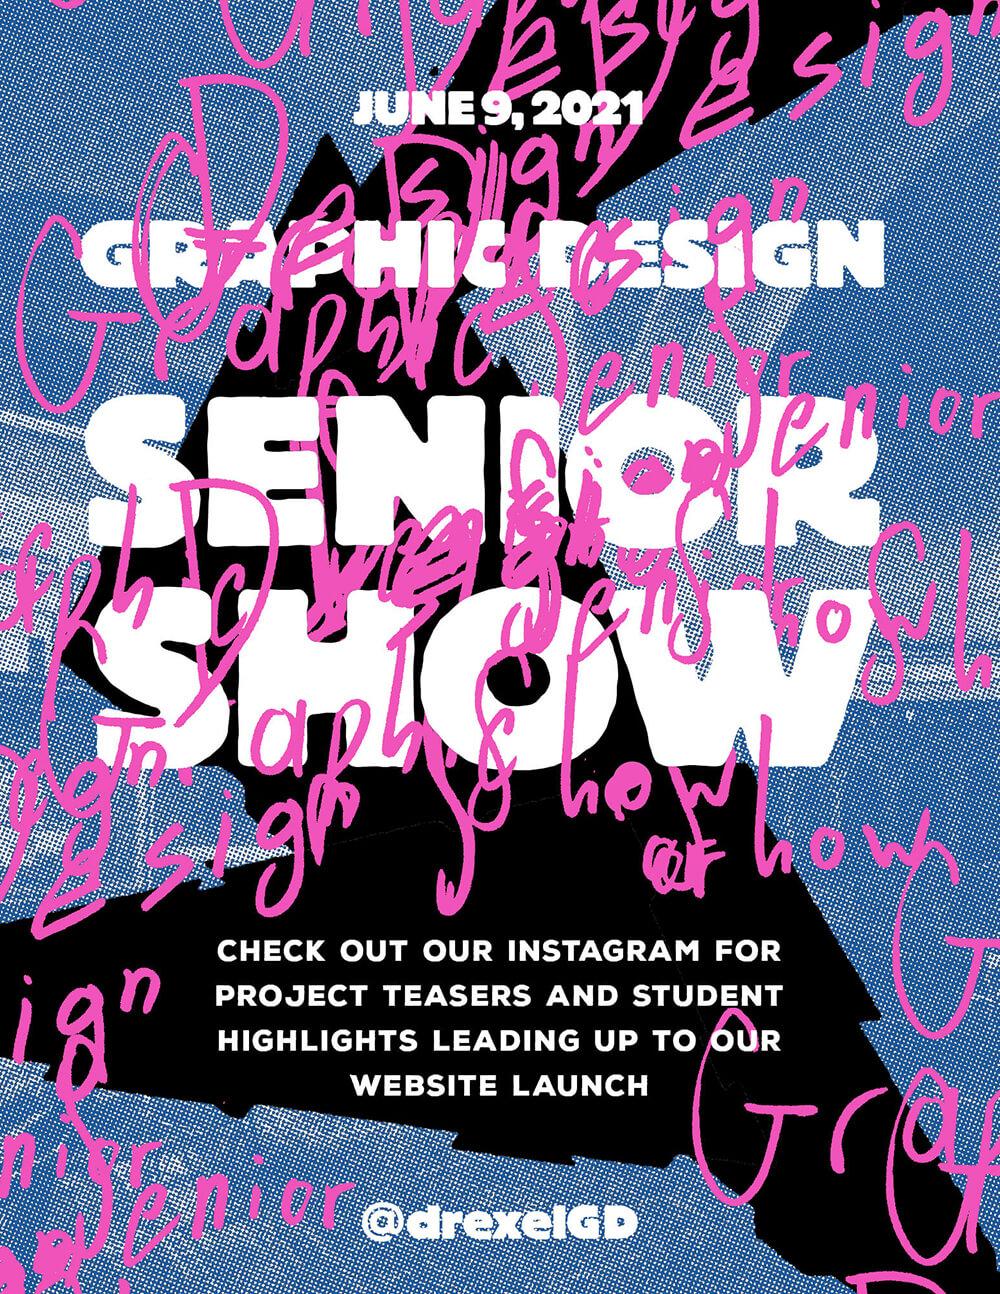 senior-show-luka-4-1